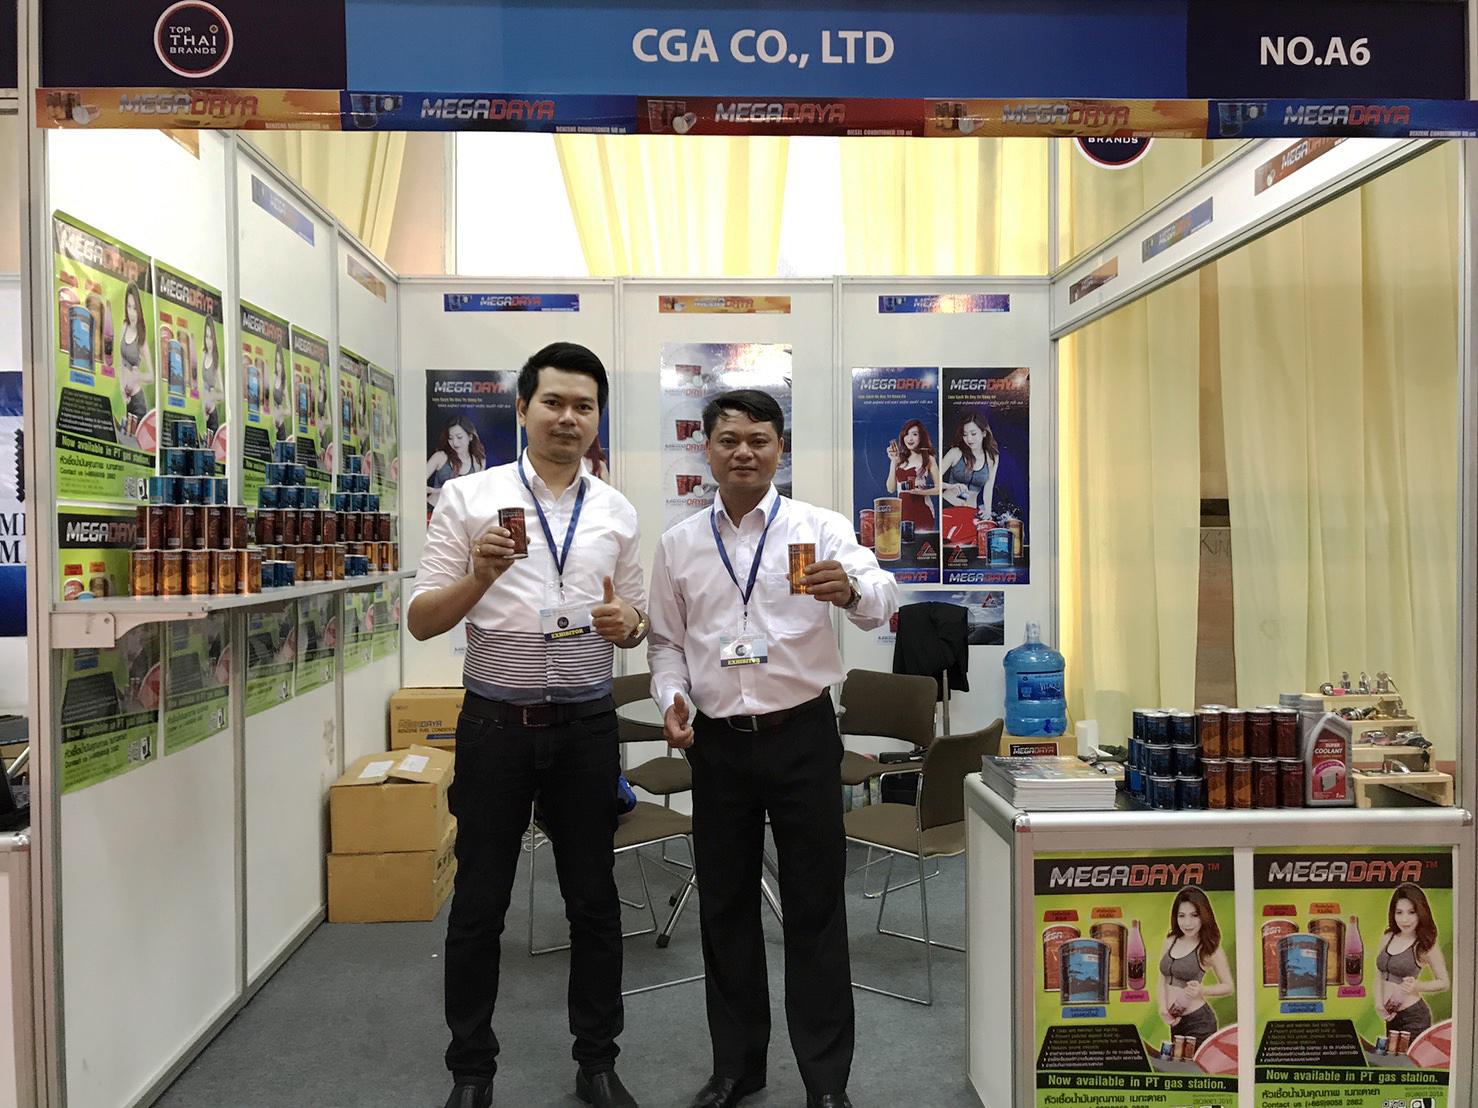 TOP THAI BRANDS 2017 IN HANOI, VIETNAM